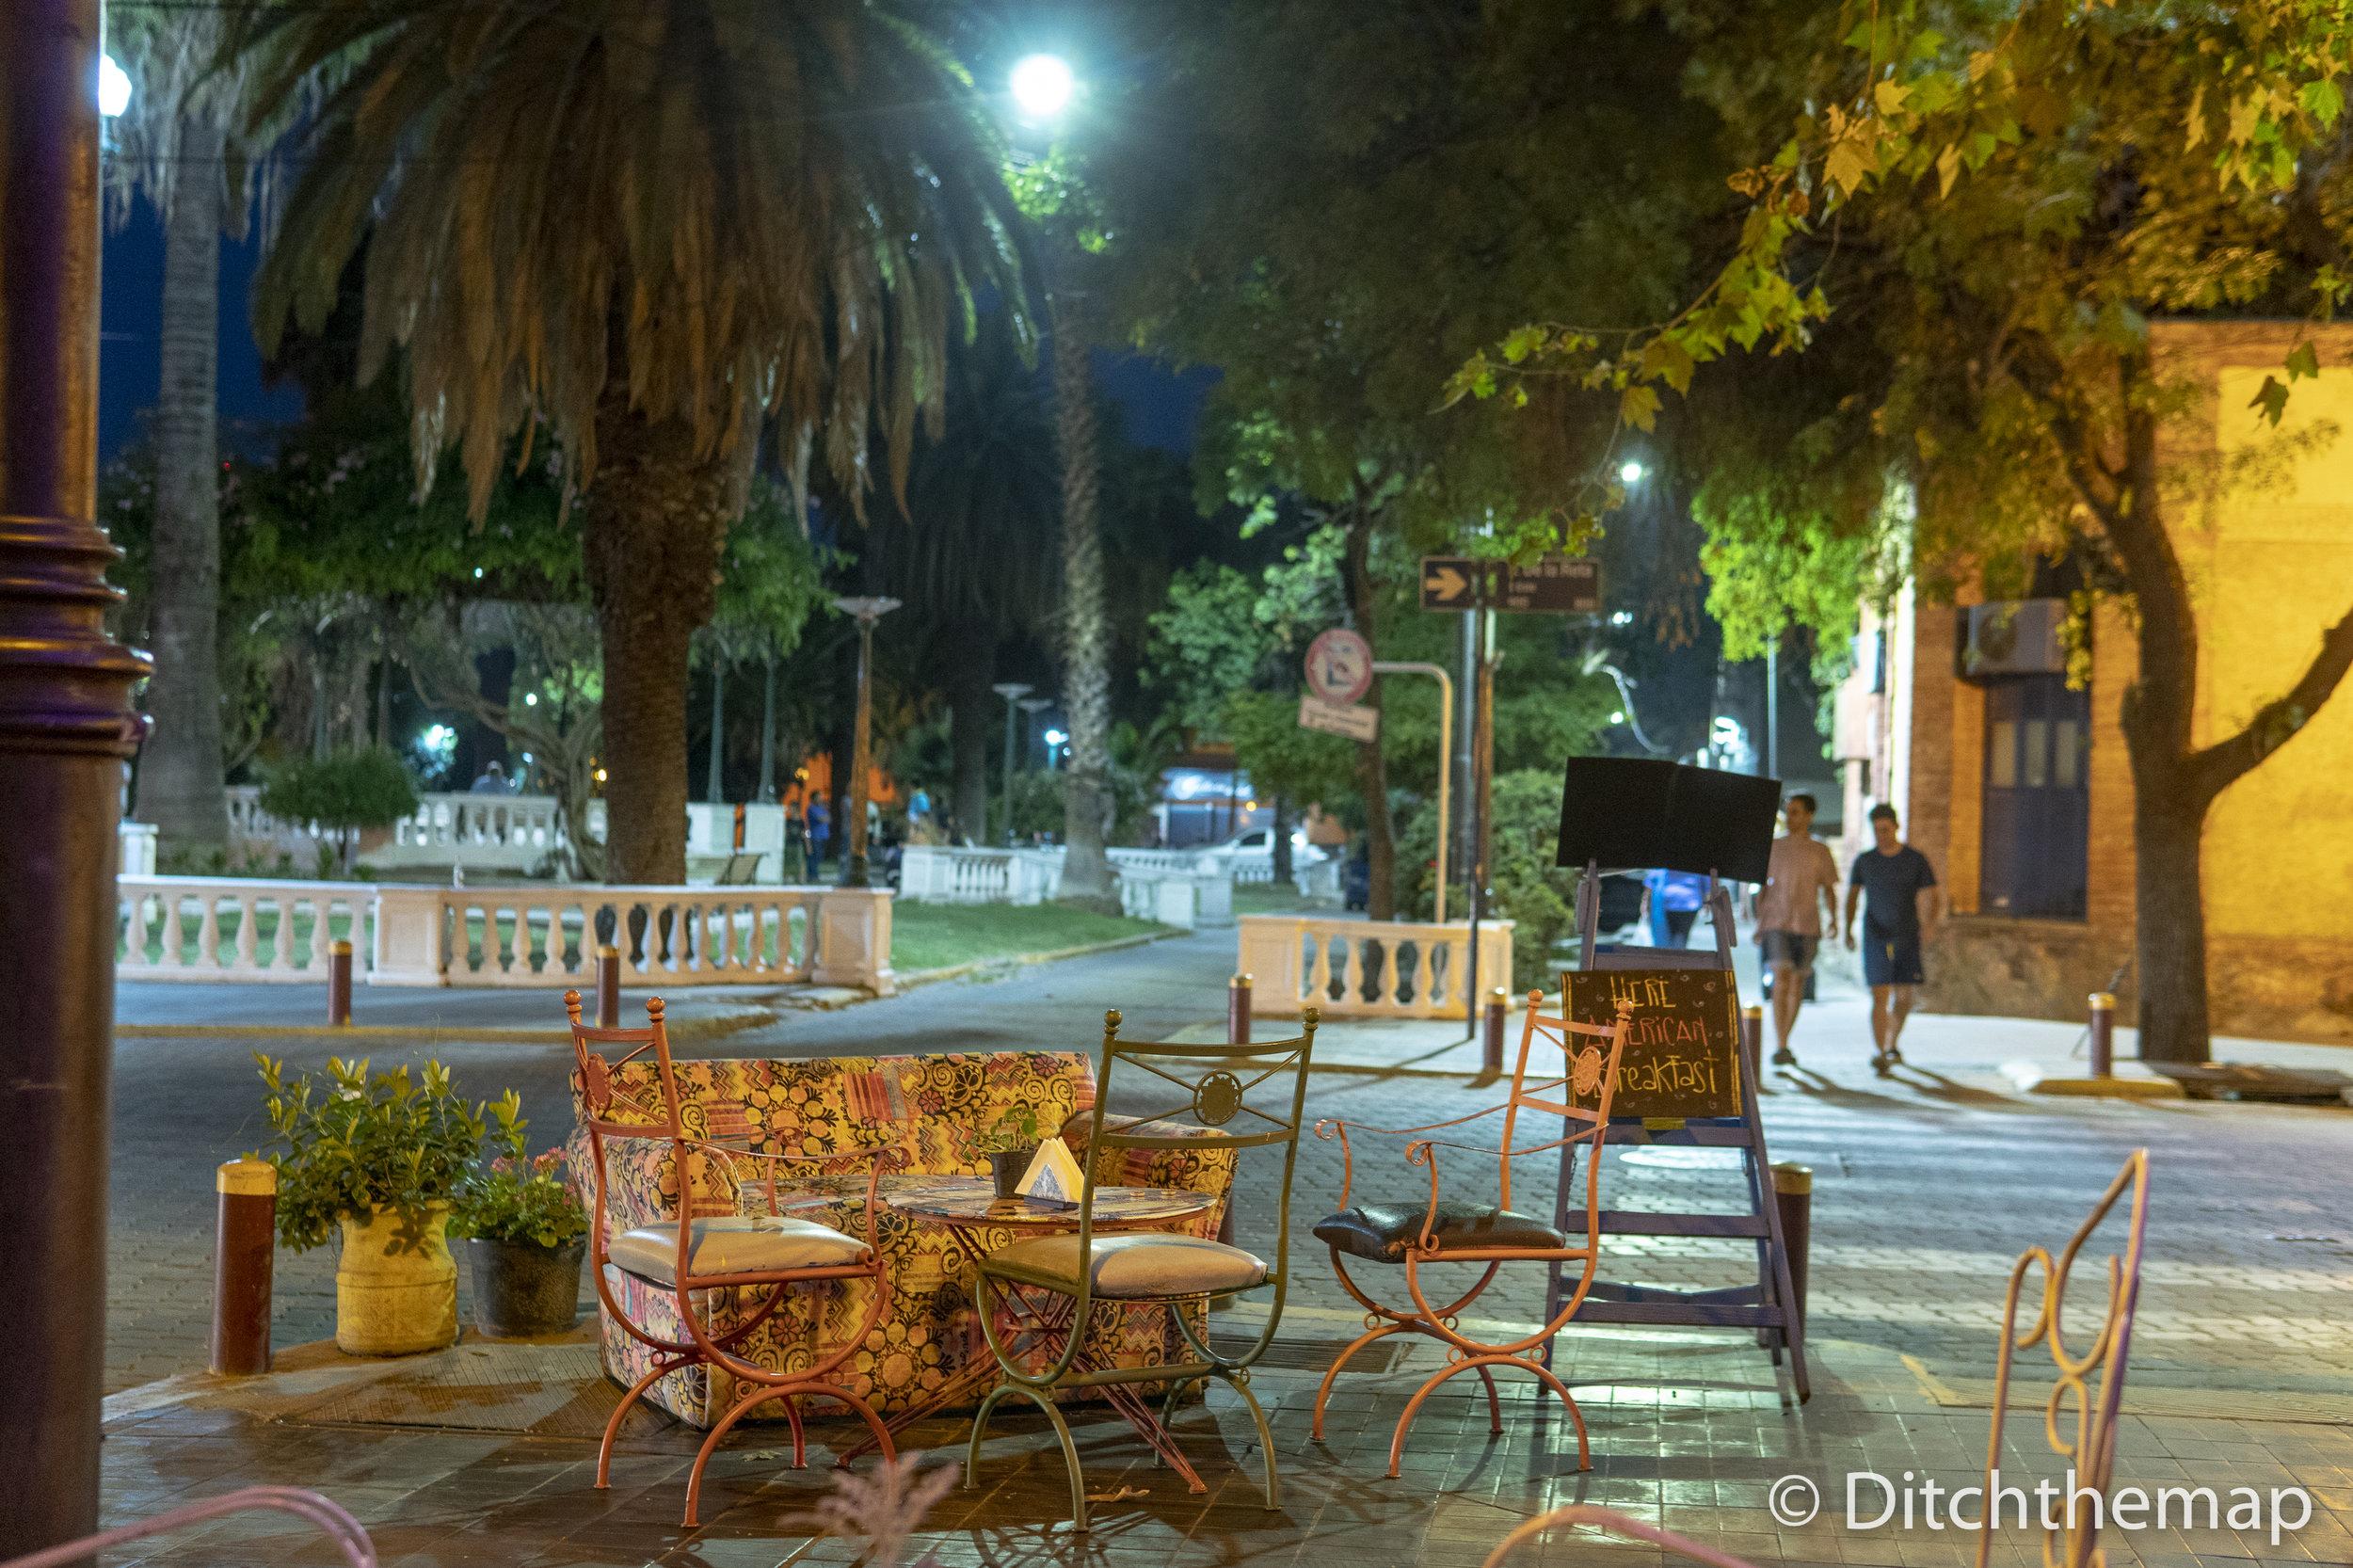 Beirut Cafe in Mendoza, Argentina